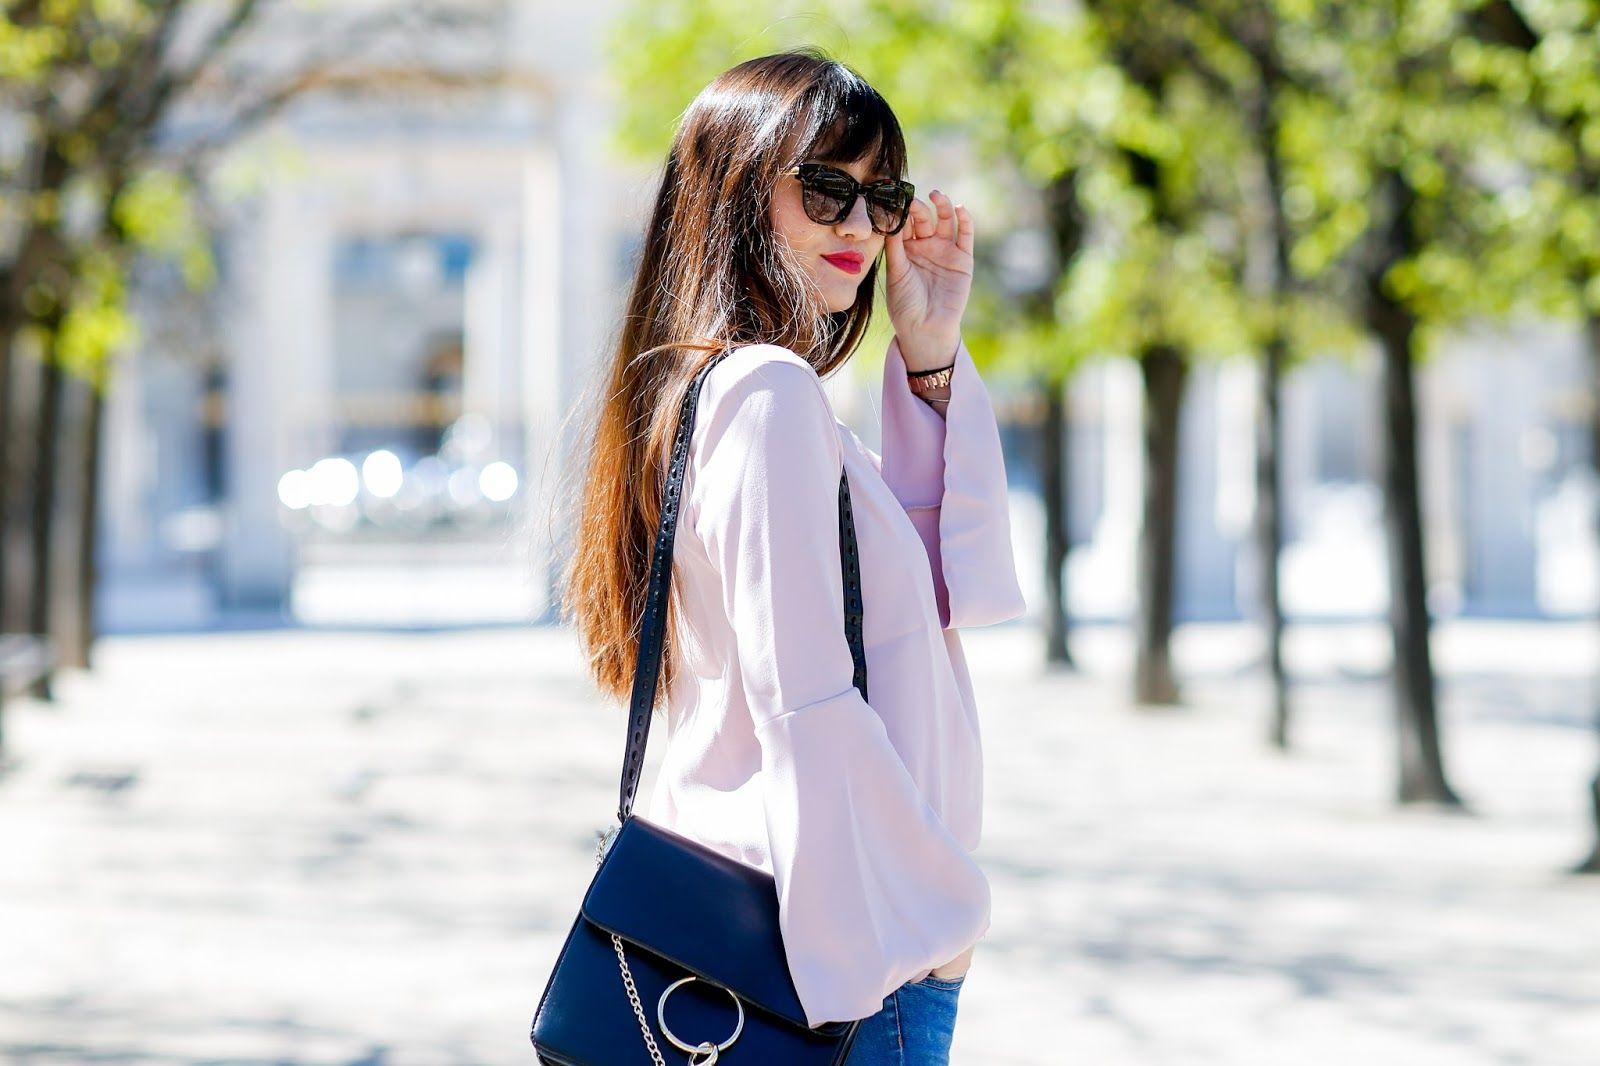 Paris, blogger, style, look, chic wish, parisian style, meet me in paree, fashion